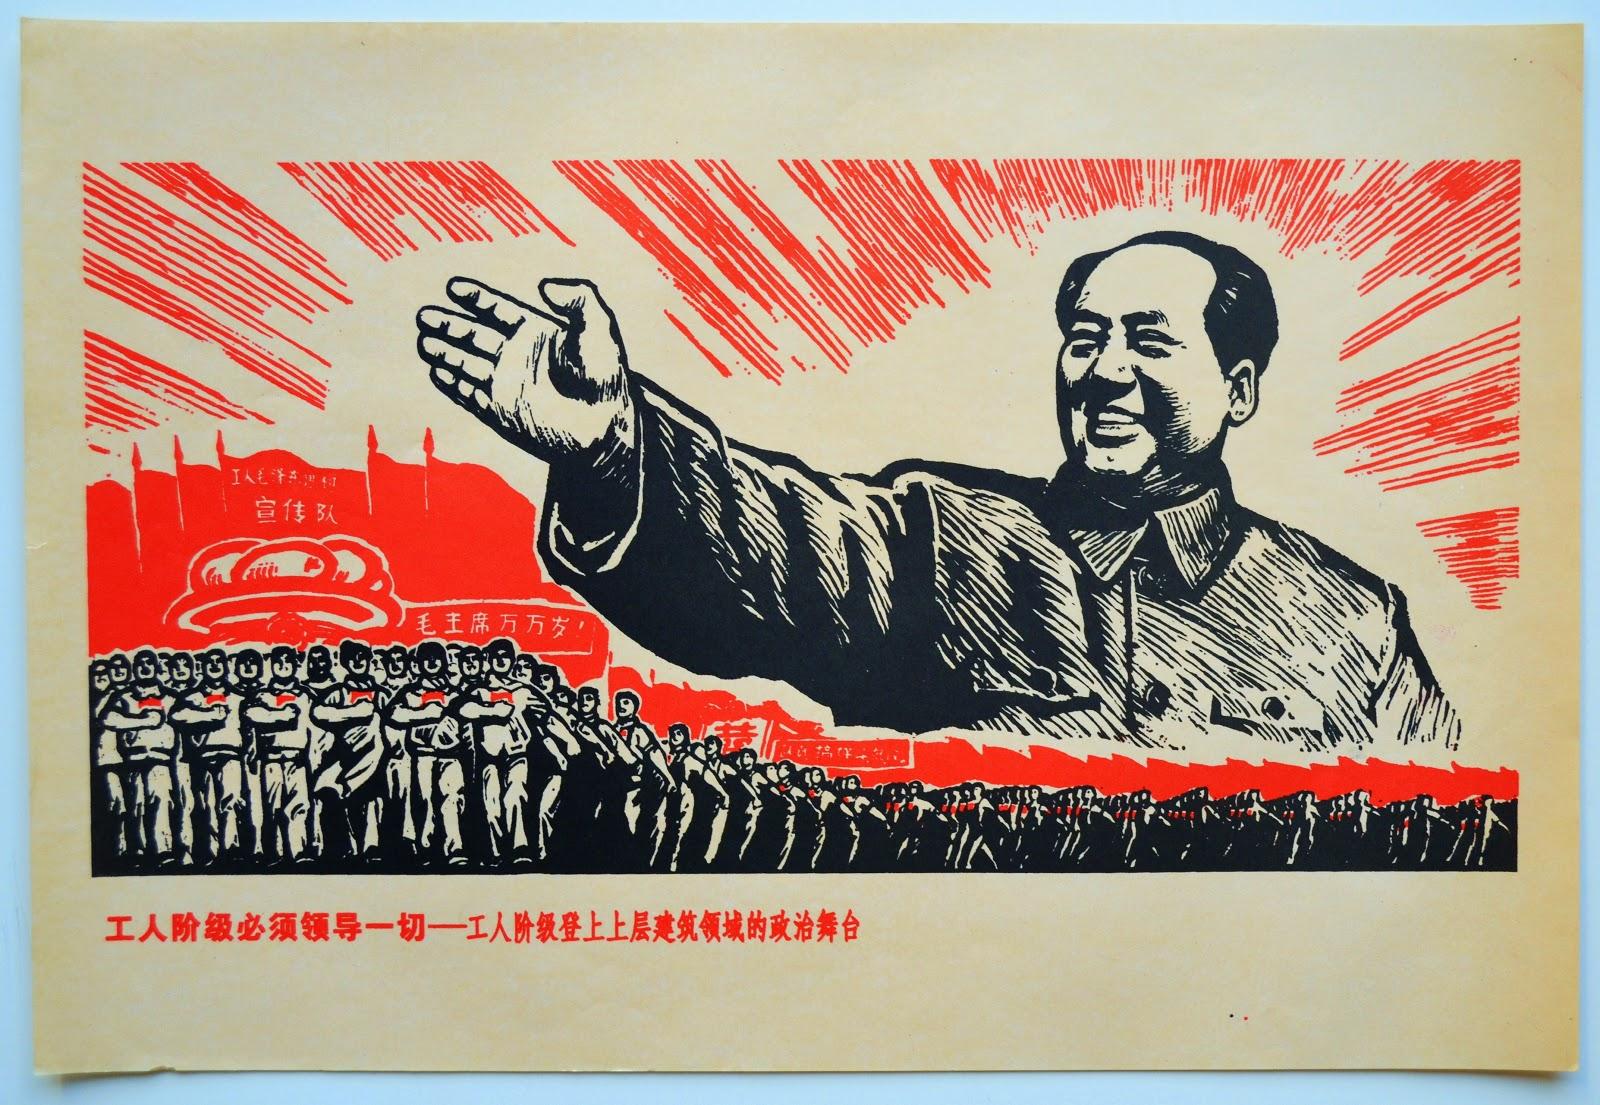 Carteles originales propaganda comunismo chino a os 60 - Carteles originales ...